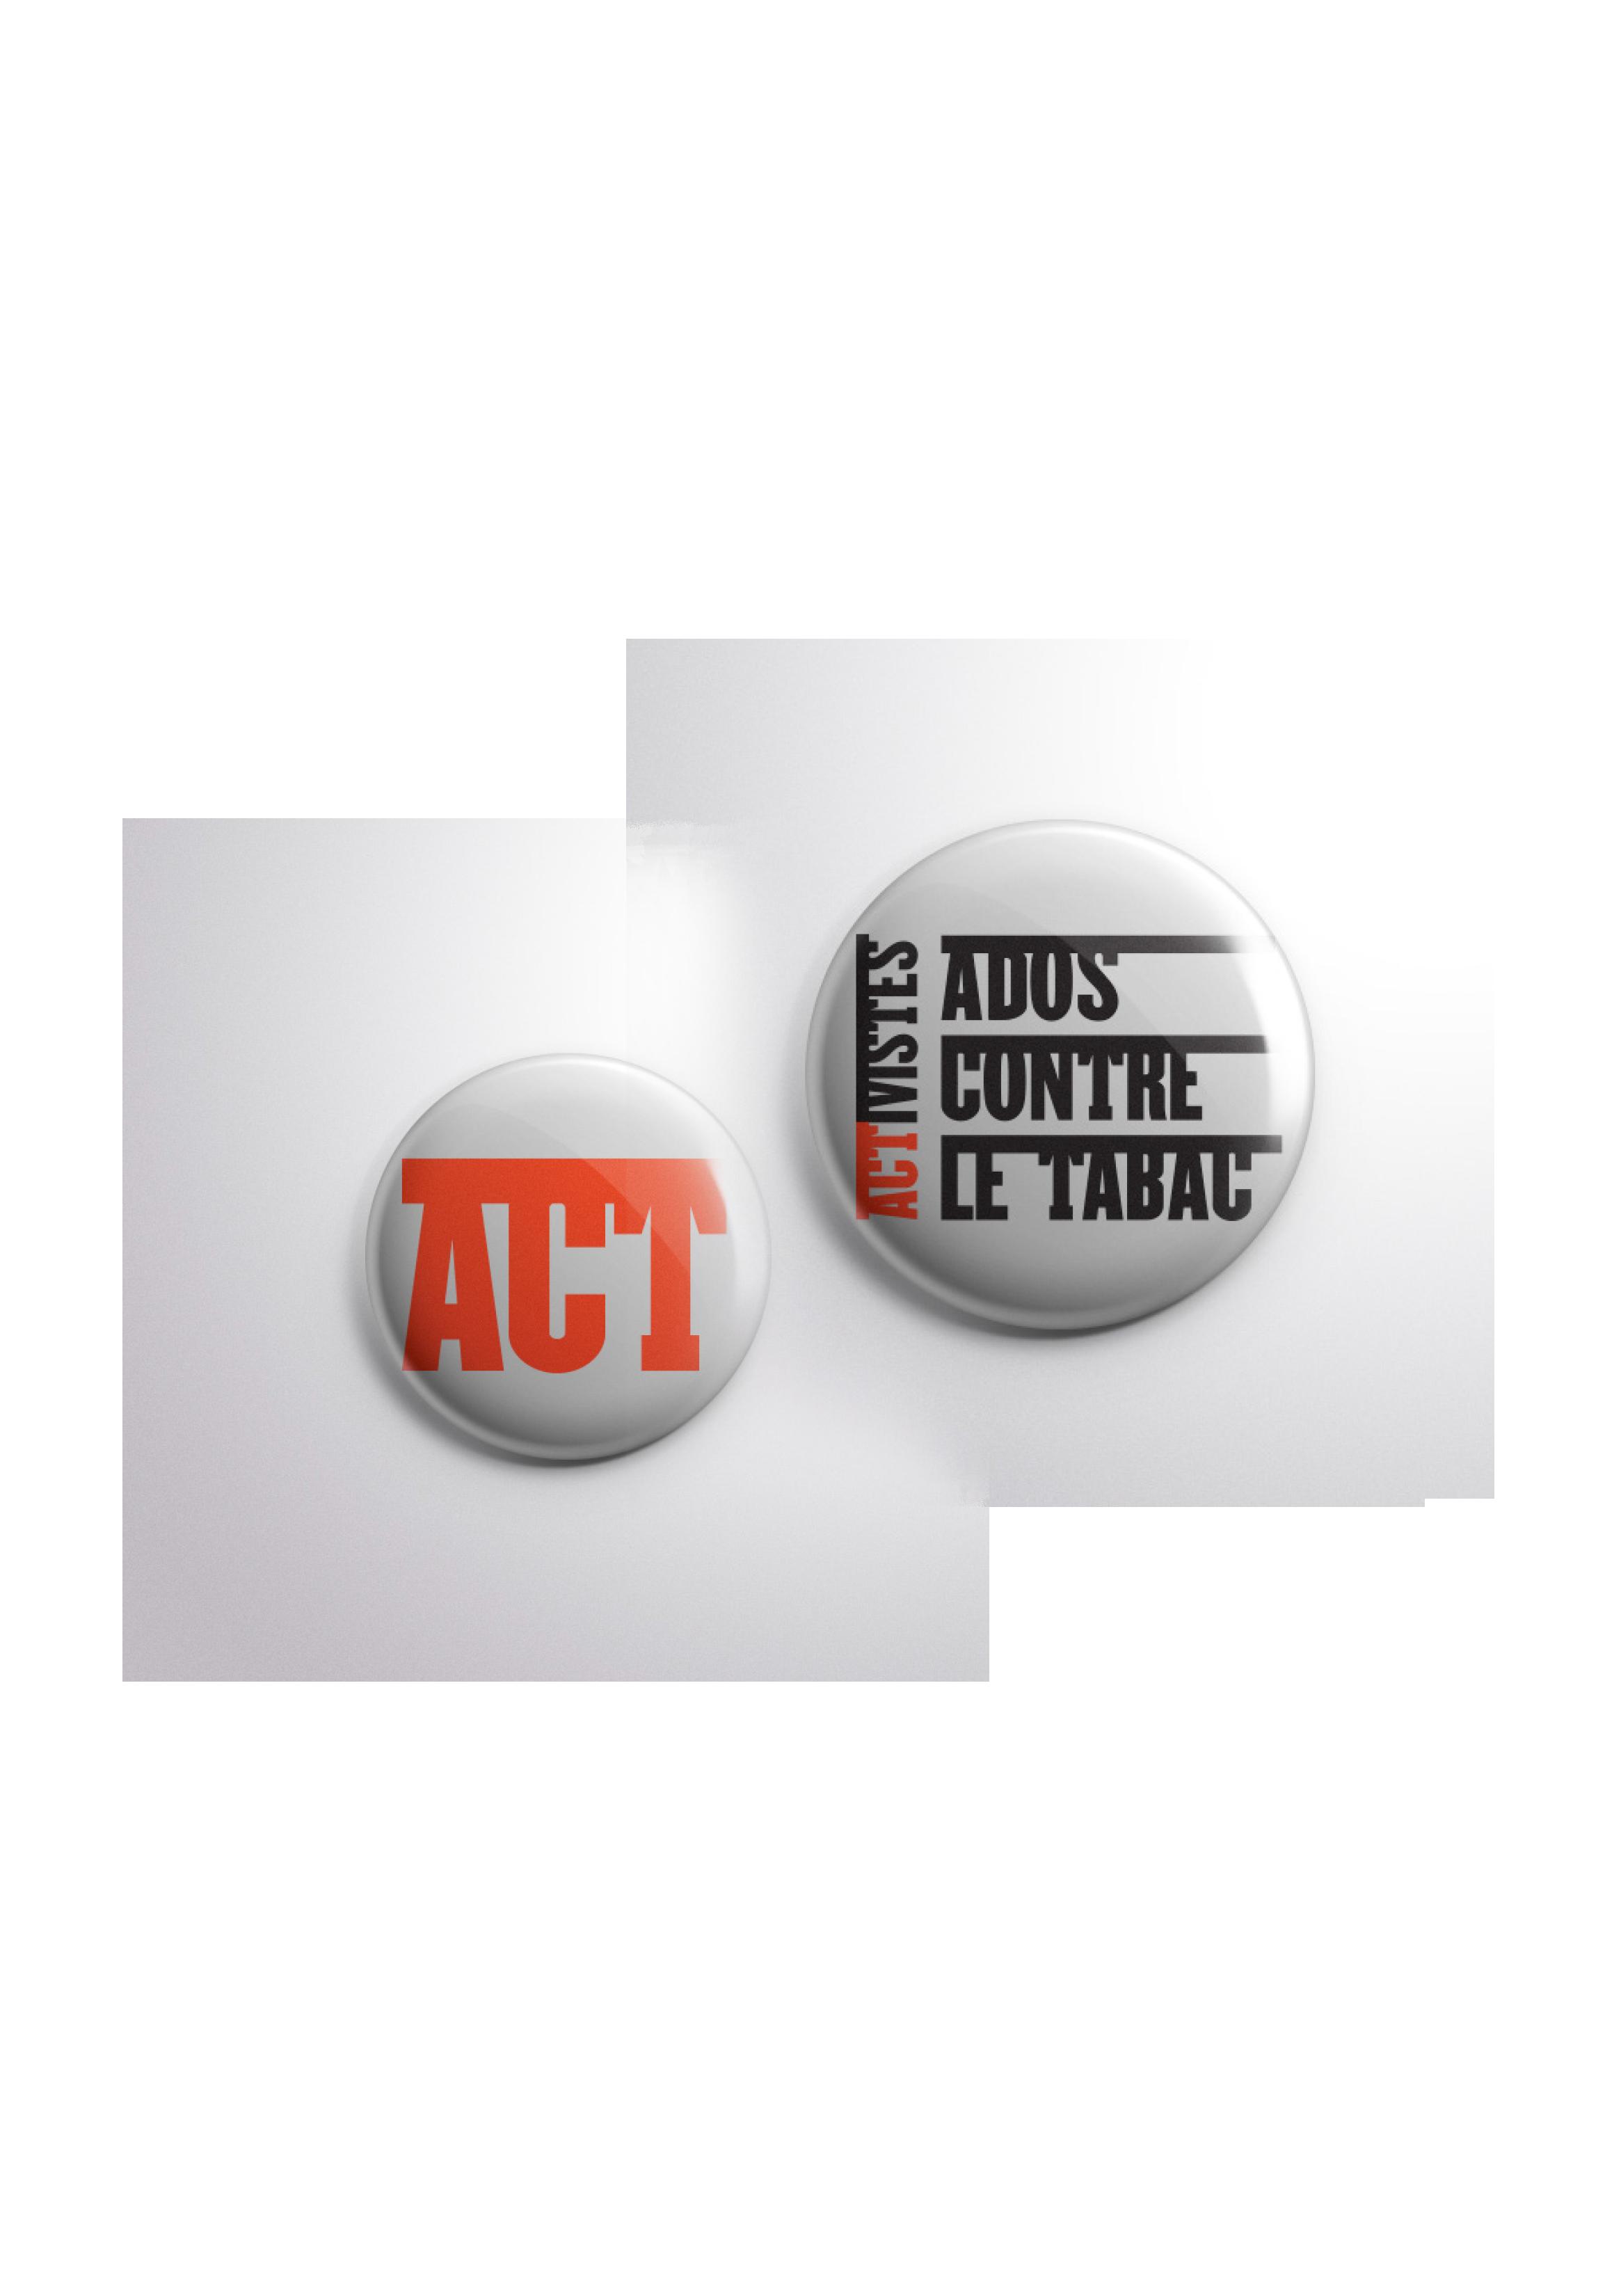 ACT_brand_insitu02